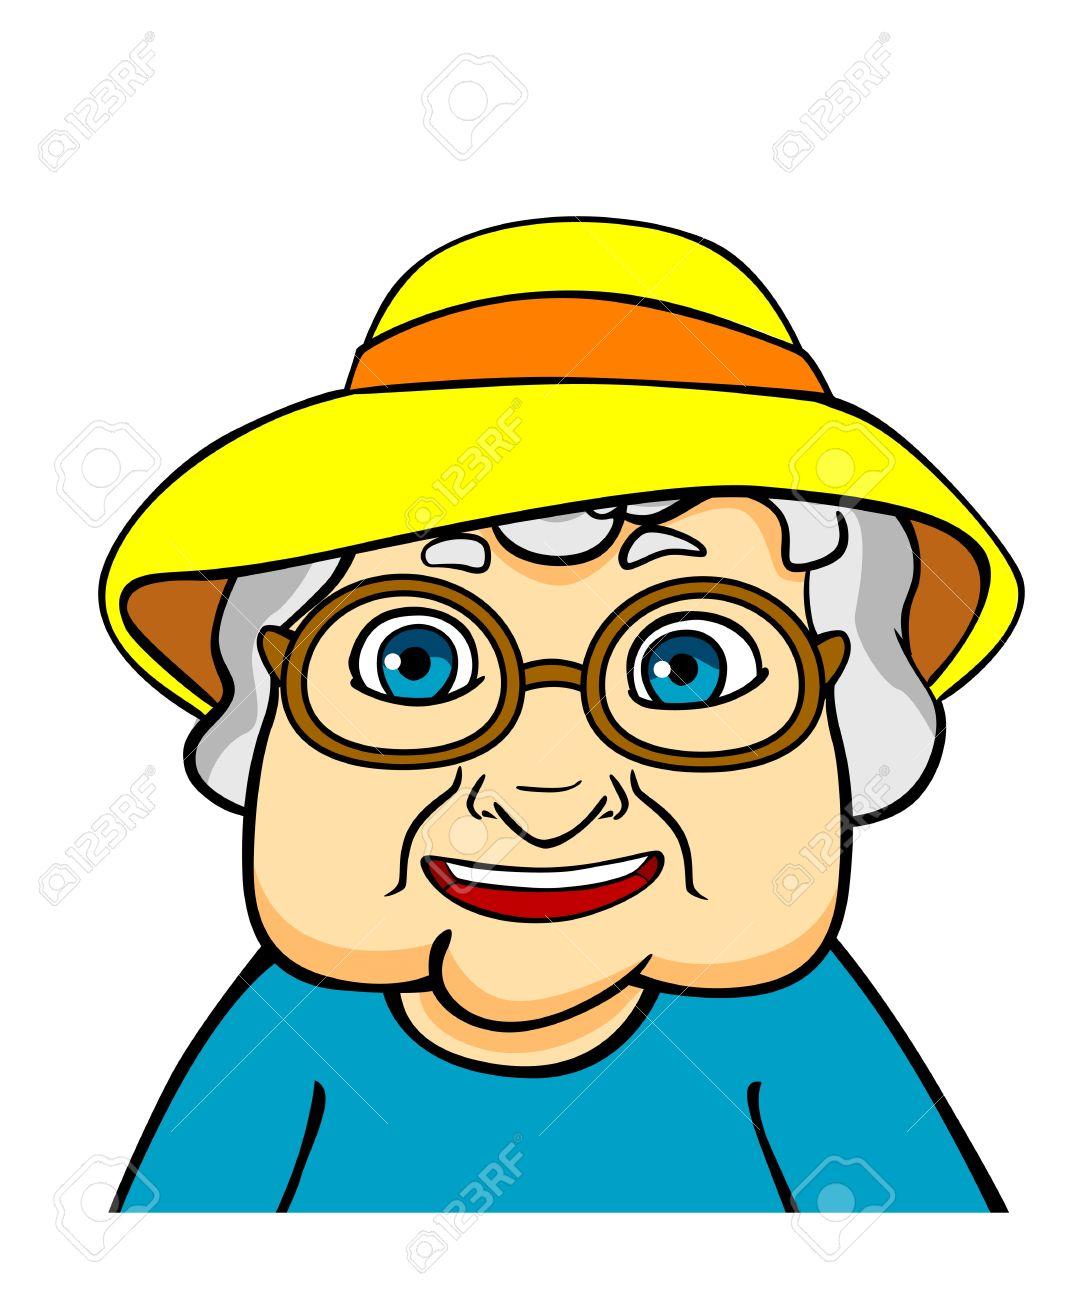 Grandmother clipart face, Grandmother face Transparent FREE.